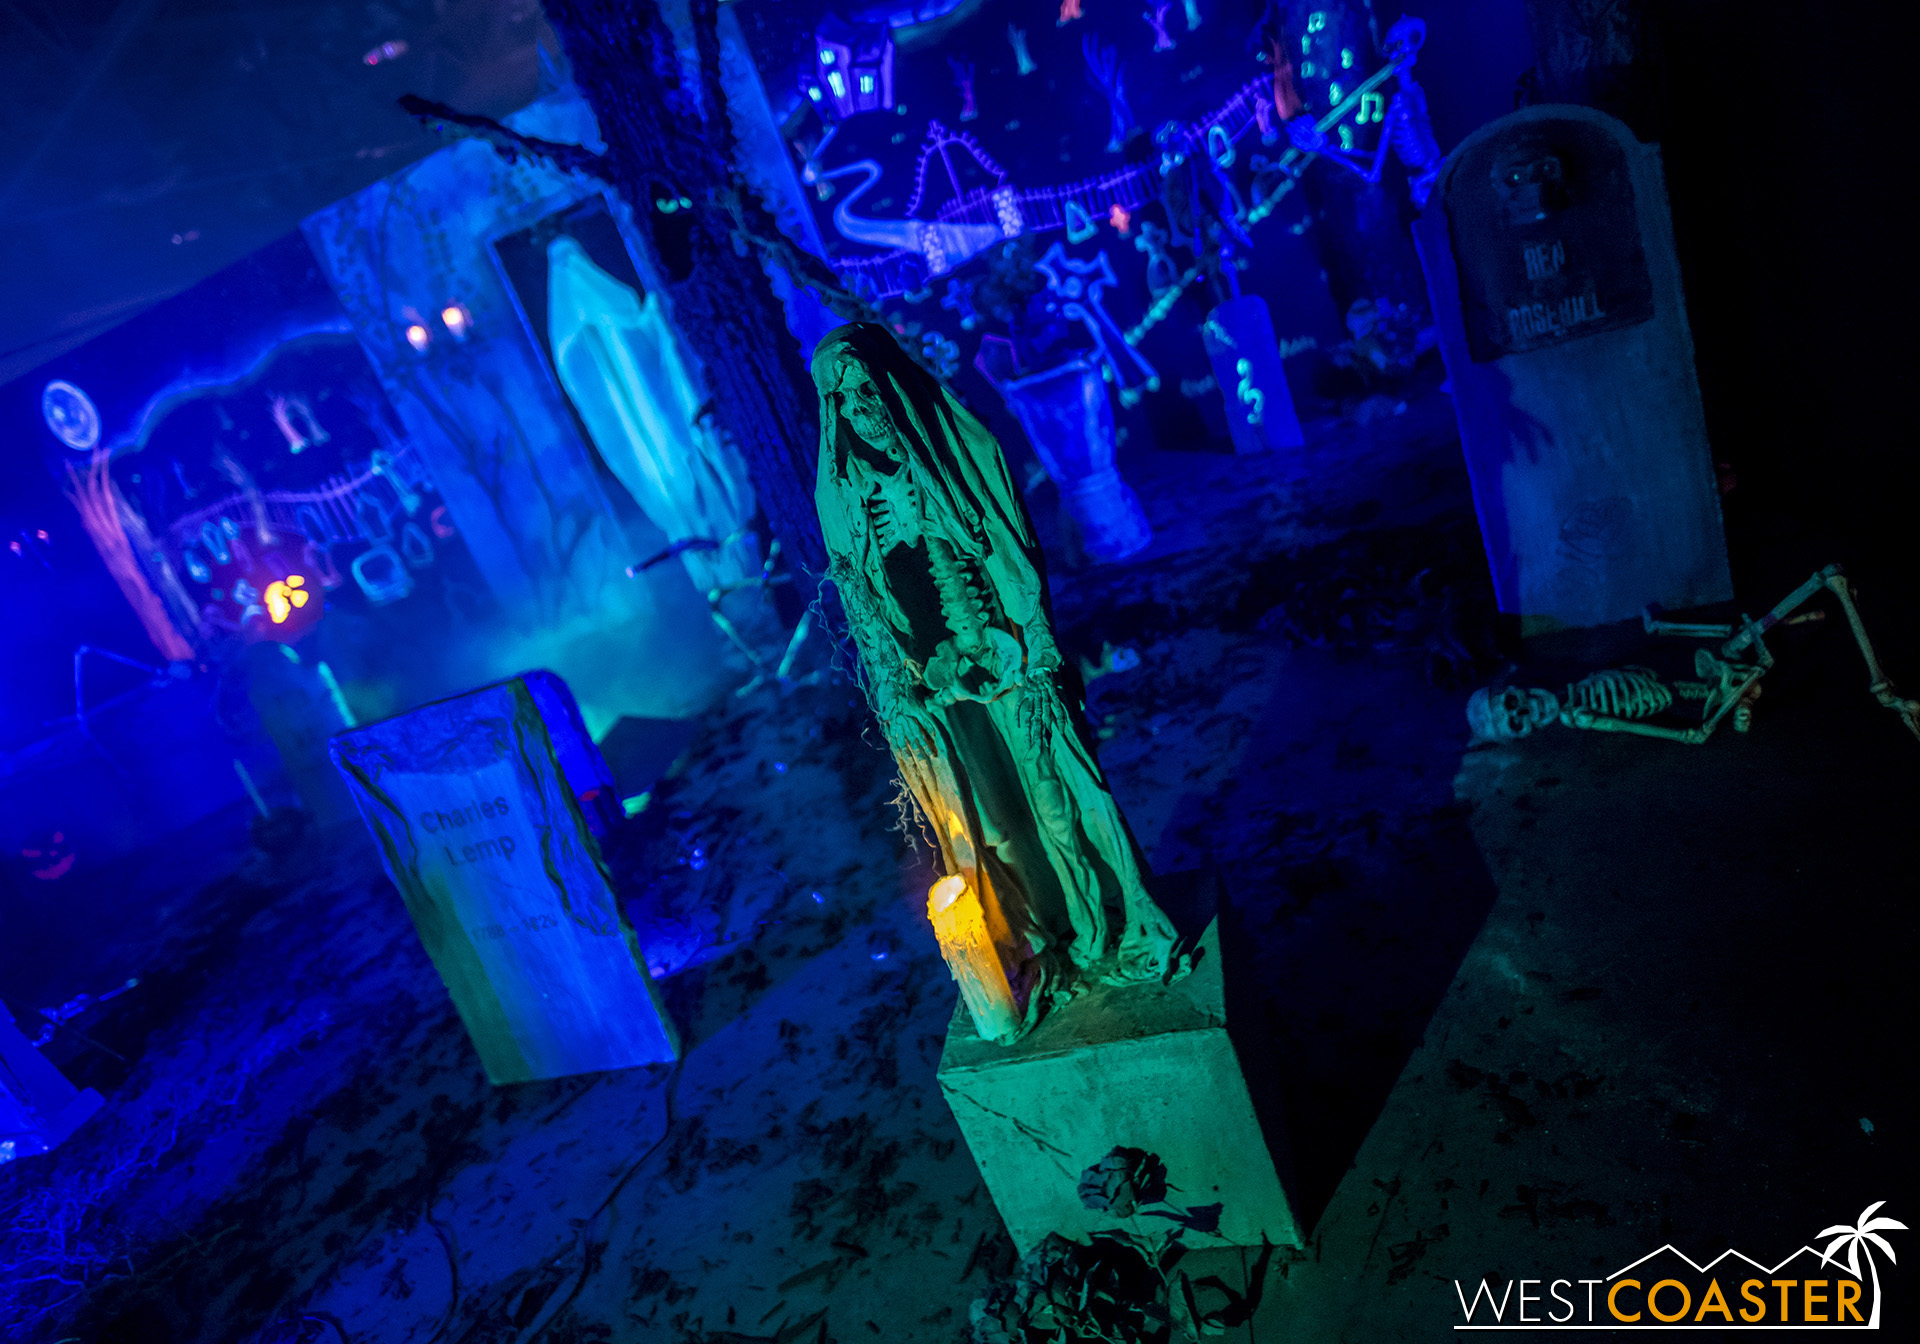 MSS-19_0809-02-RosehillHaunt-CemeteryCelebration-0007.jpg